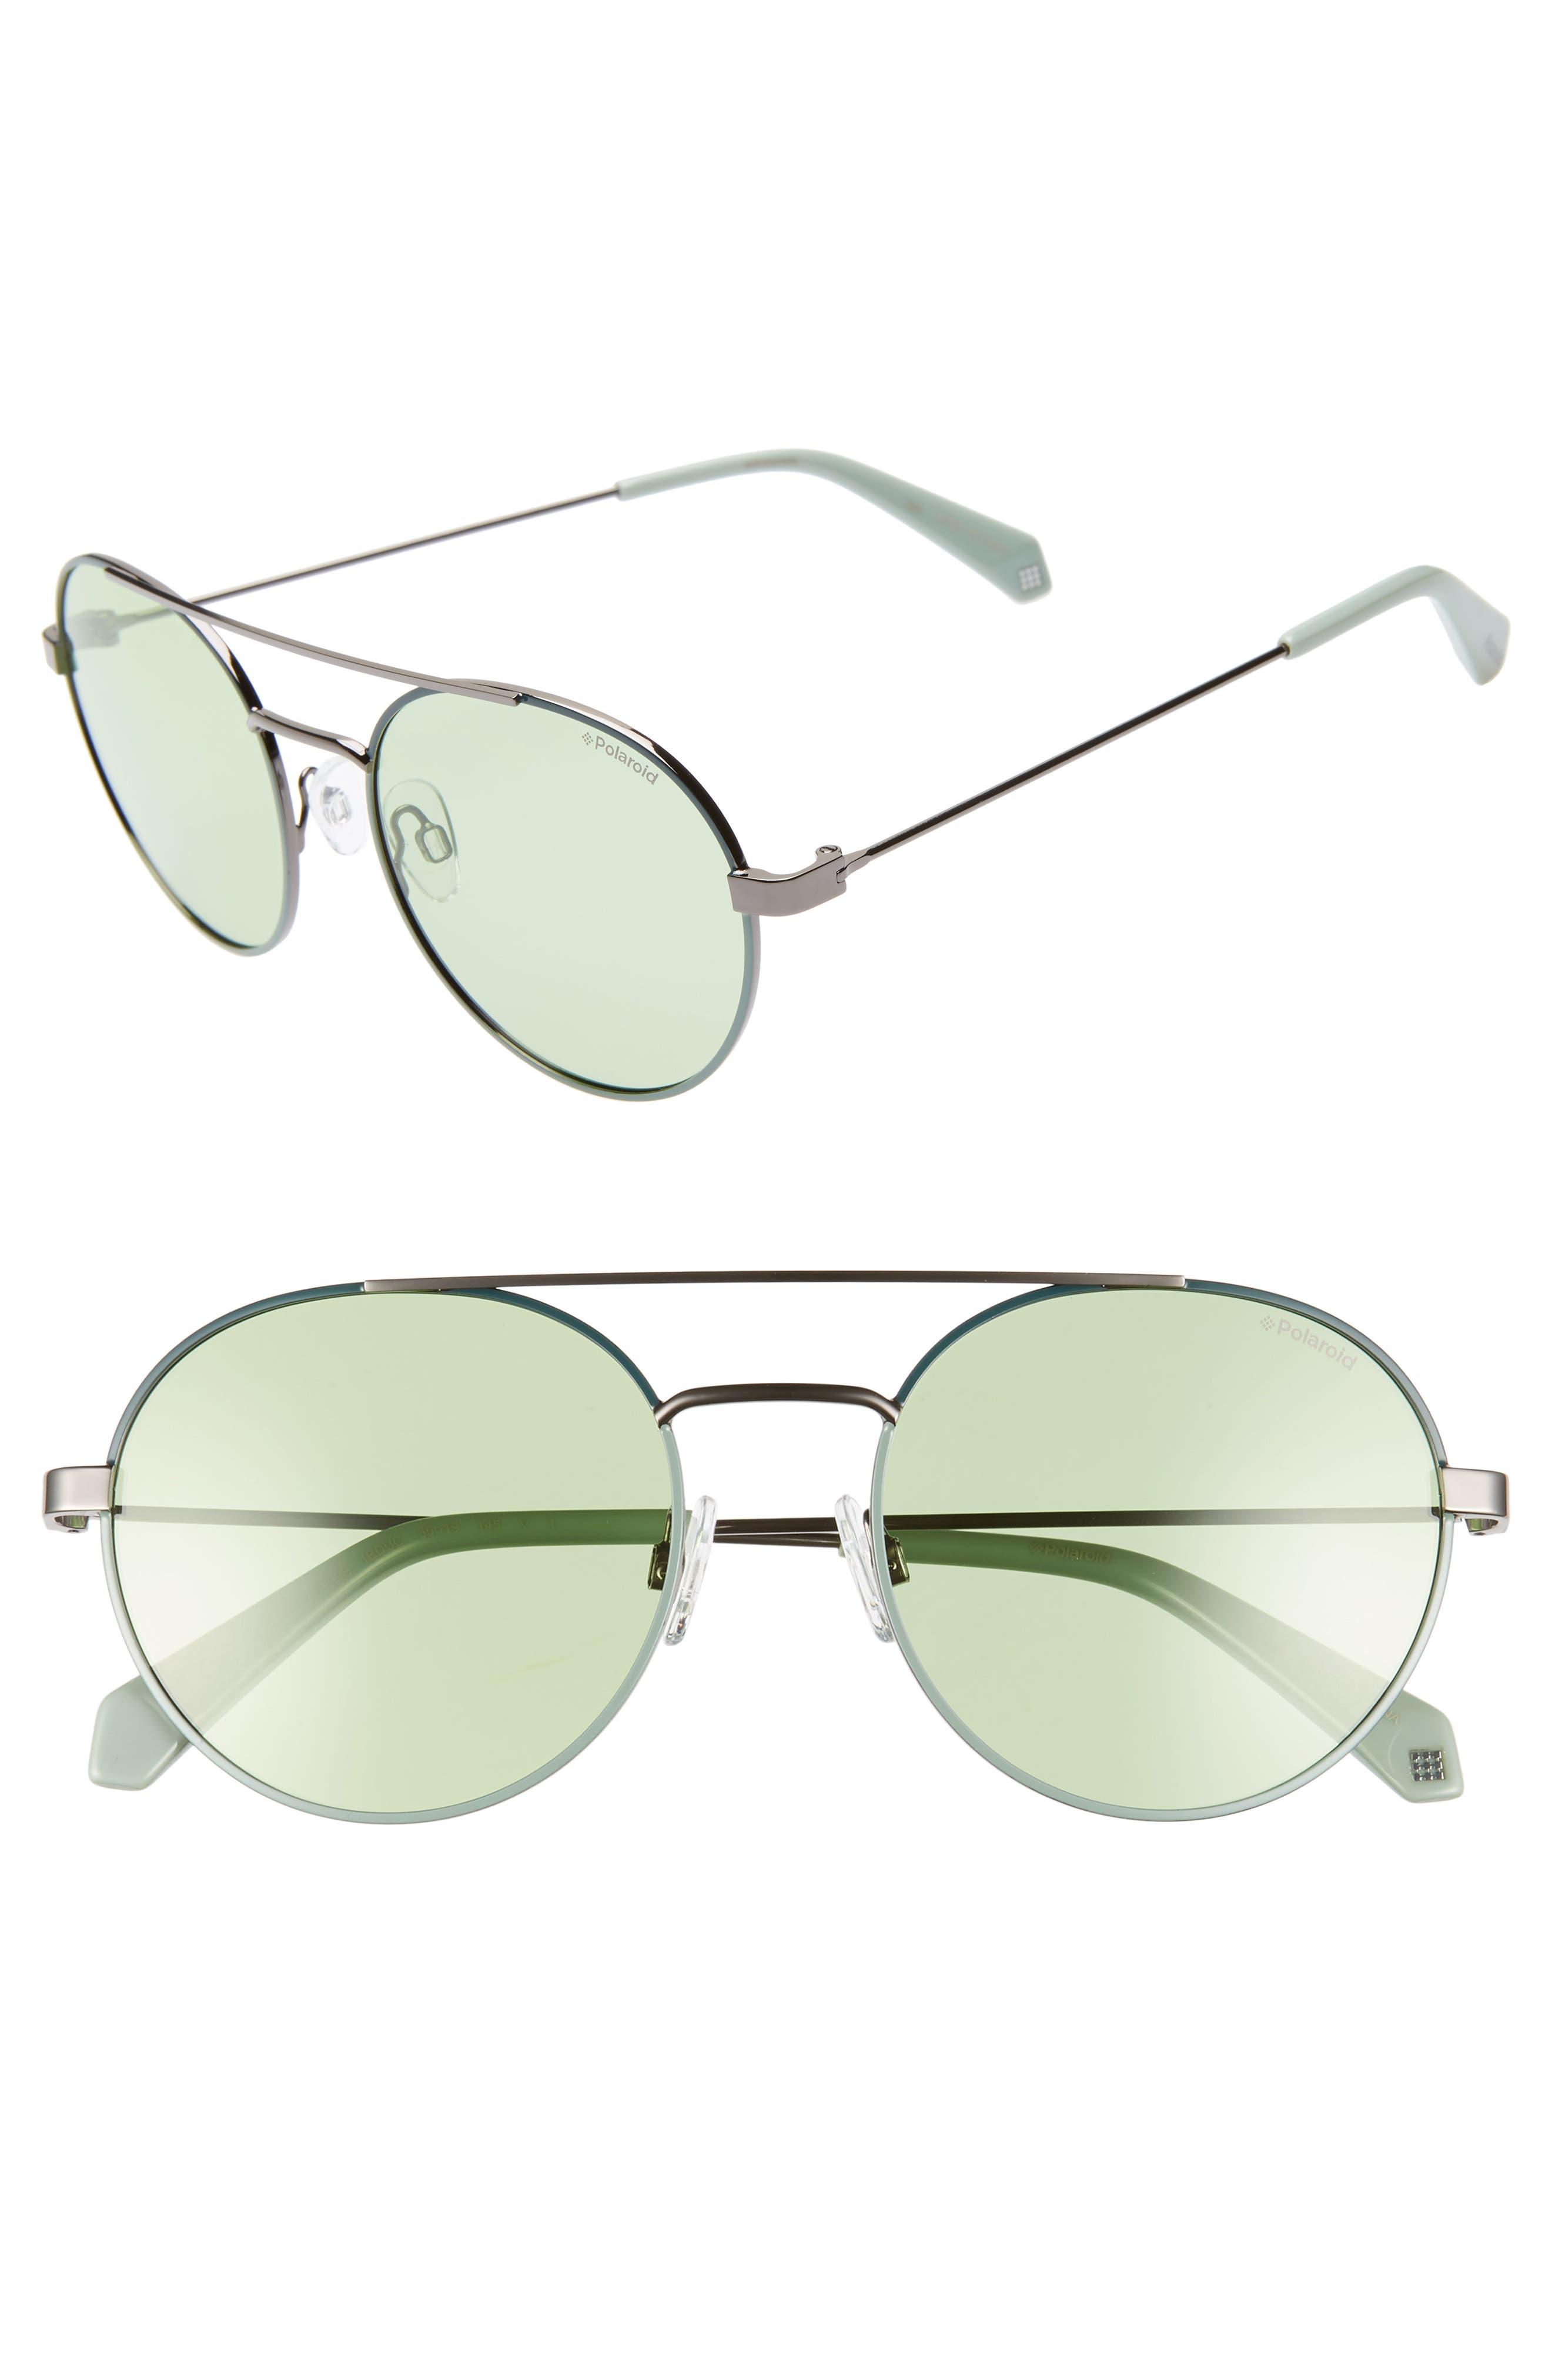 Polaroid Round 55Mm Polarized Sunglasses - Green